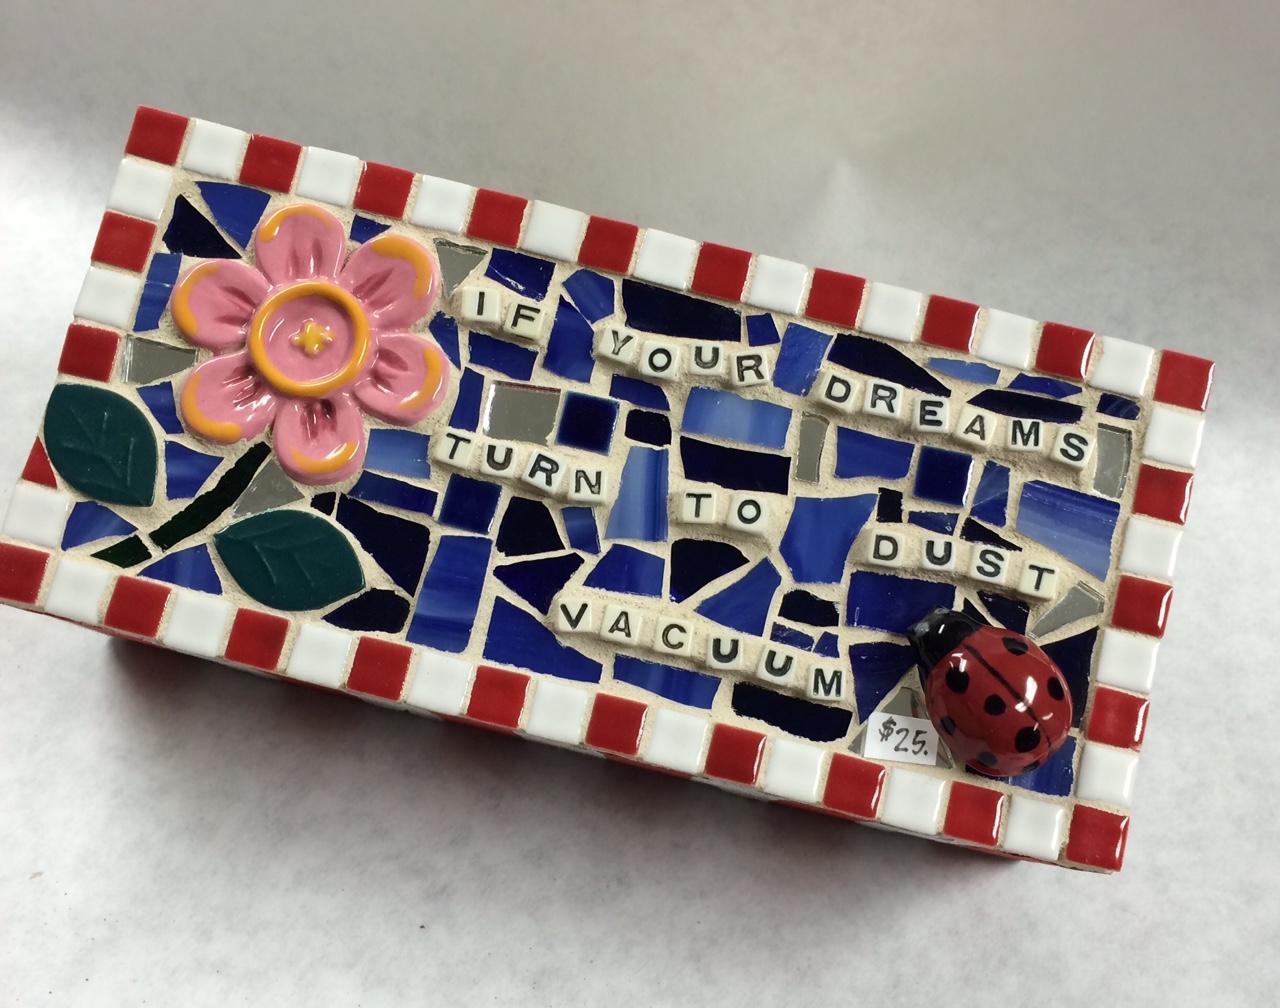 Mosaic Brick by Heidi Borchers